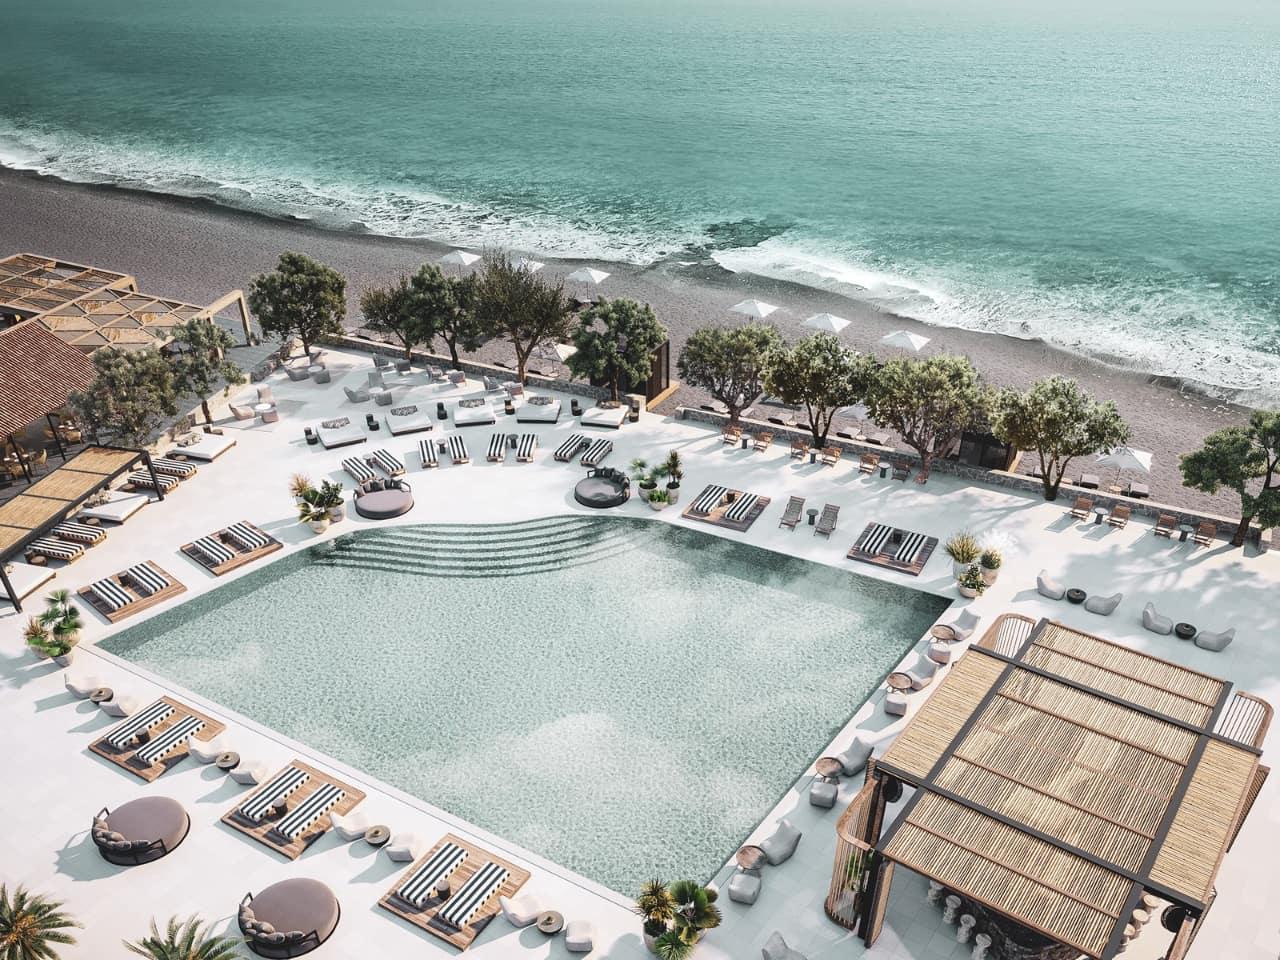 Numo_Ierapetra_Beach_Resort_-_A_brand-new_luxury_adult-friendly_and_barefoot_beach_resort_in_Ierapetra